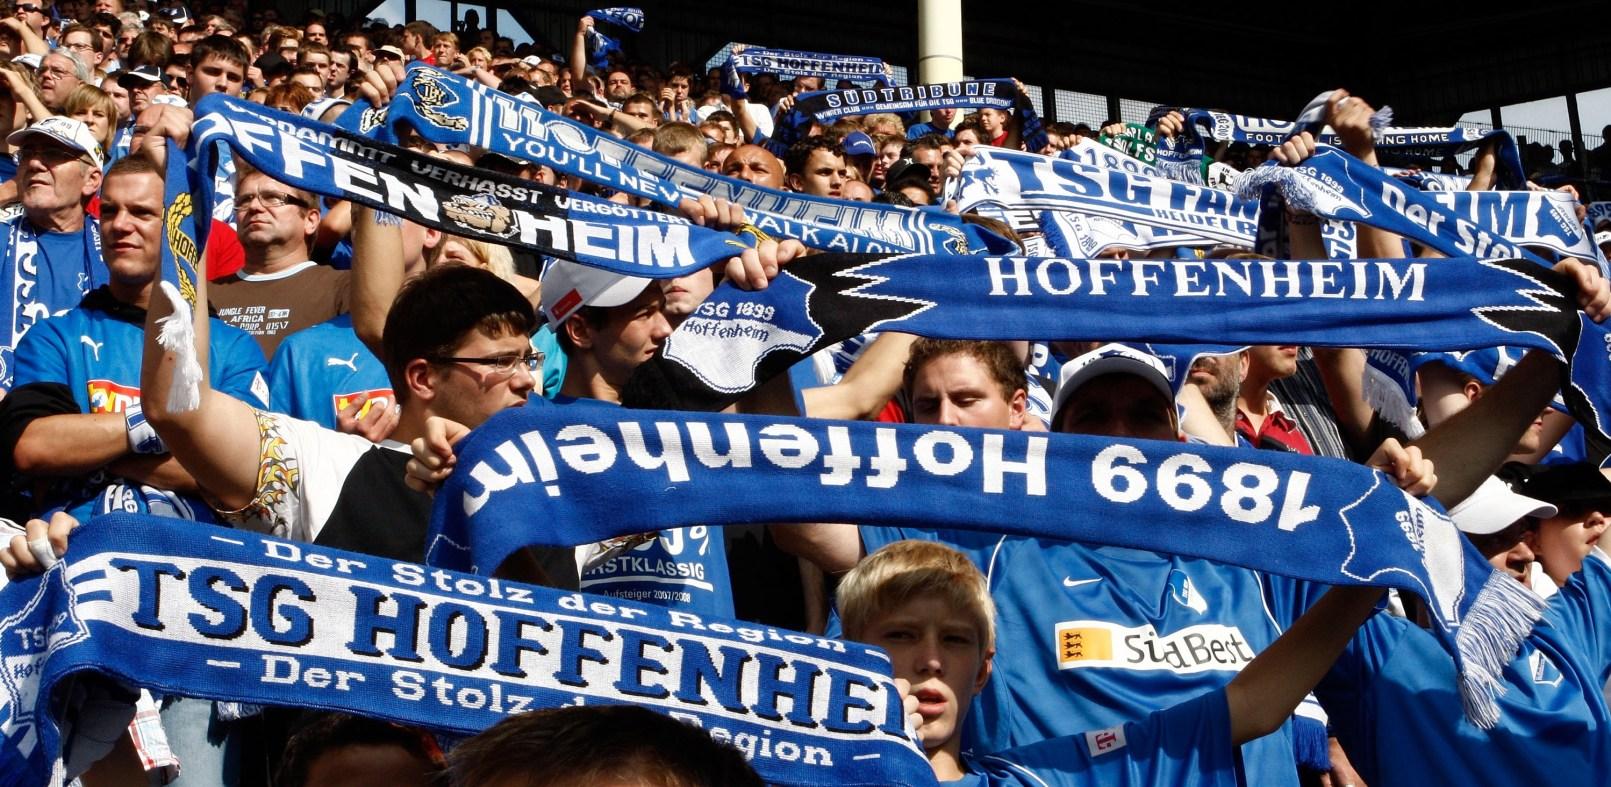 MANNHEIM, GERMANY - AUGUST 23: The Fans of TSG 1899 Hoffenheim celebrate after winning during the Bundesliga match TSG 1899 Hoffenheim against Borussia Moenchengladbach at the Carl Benz stadium in Mannheim on August 23, 2008 in Mannheim, Germany. (Photo by Thorsten Wagner/Bongarts/Getty Images)